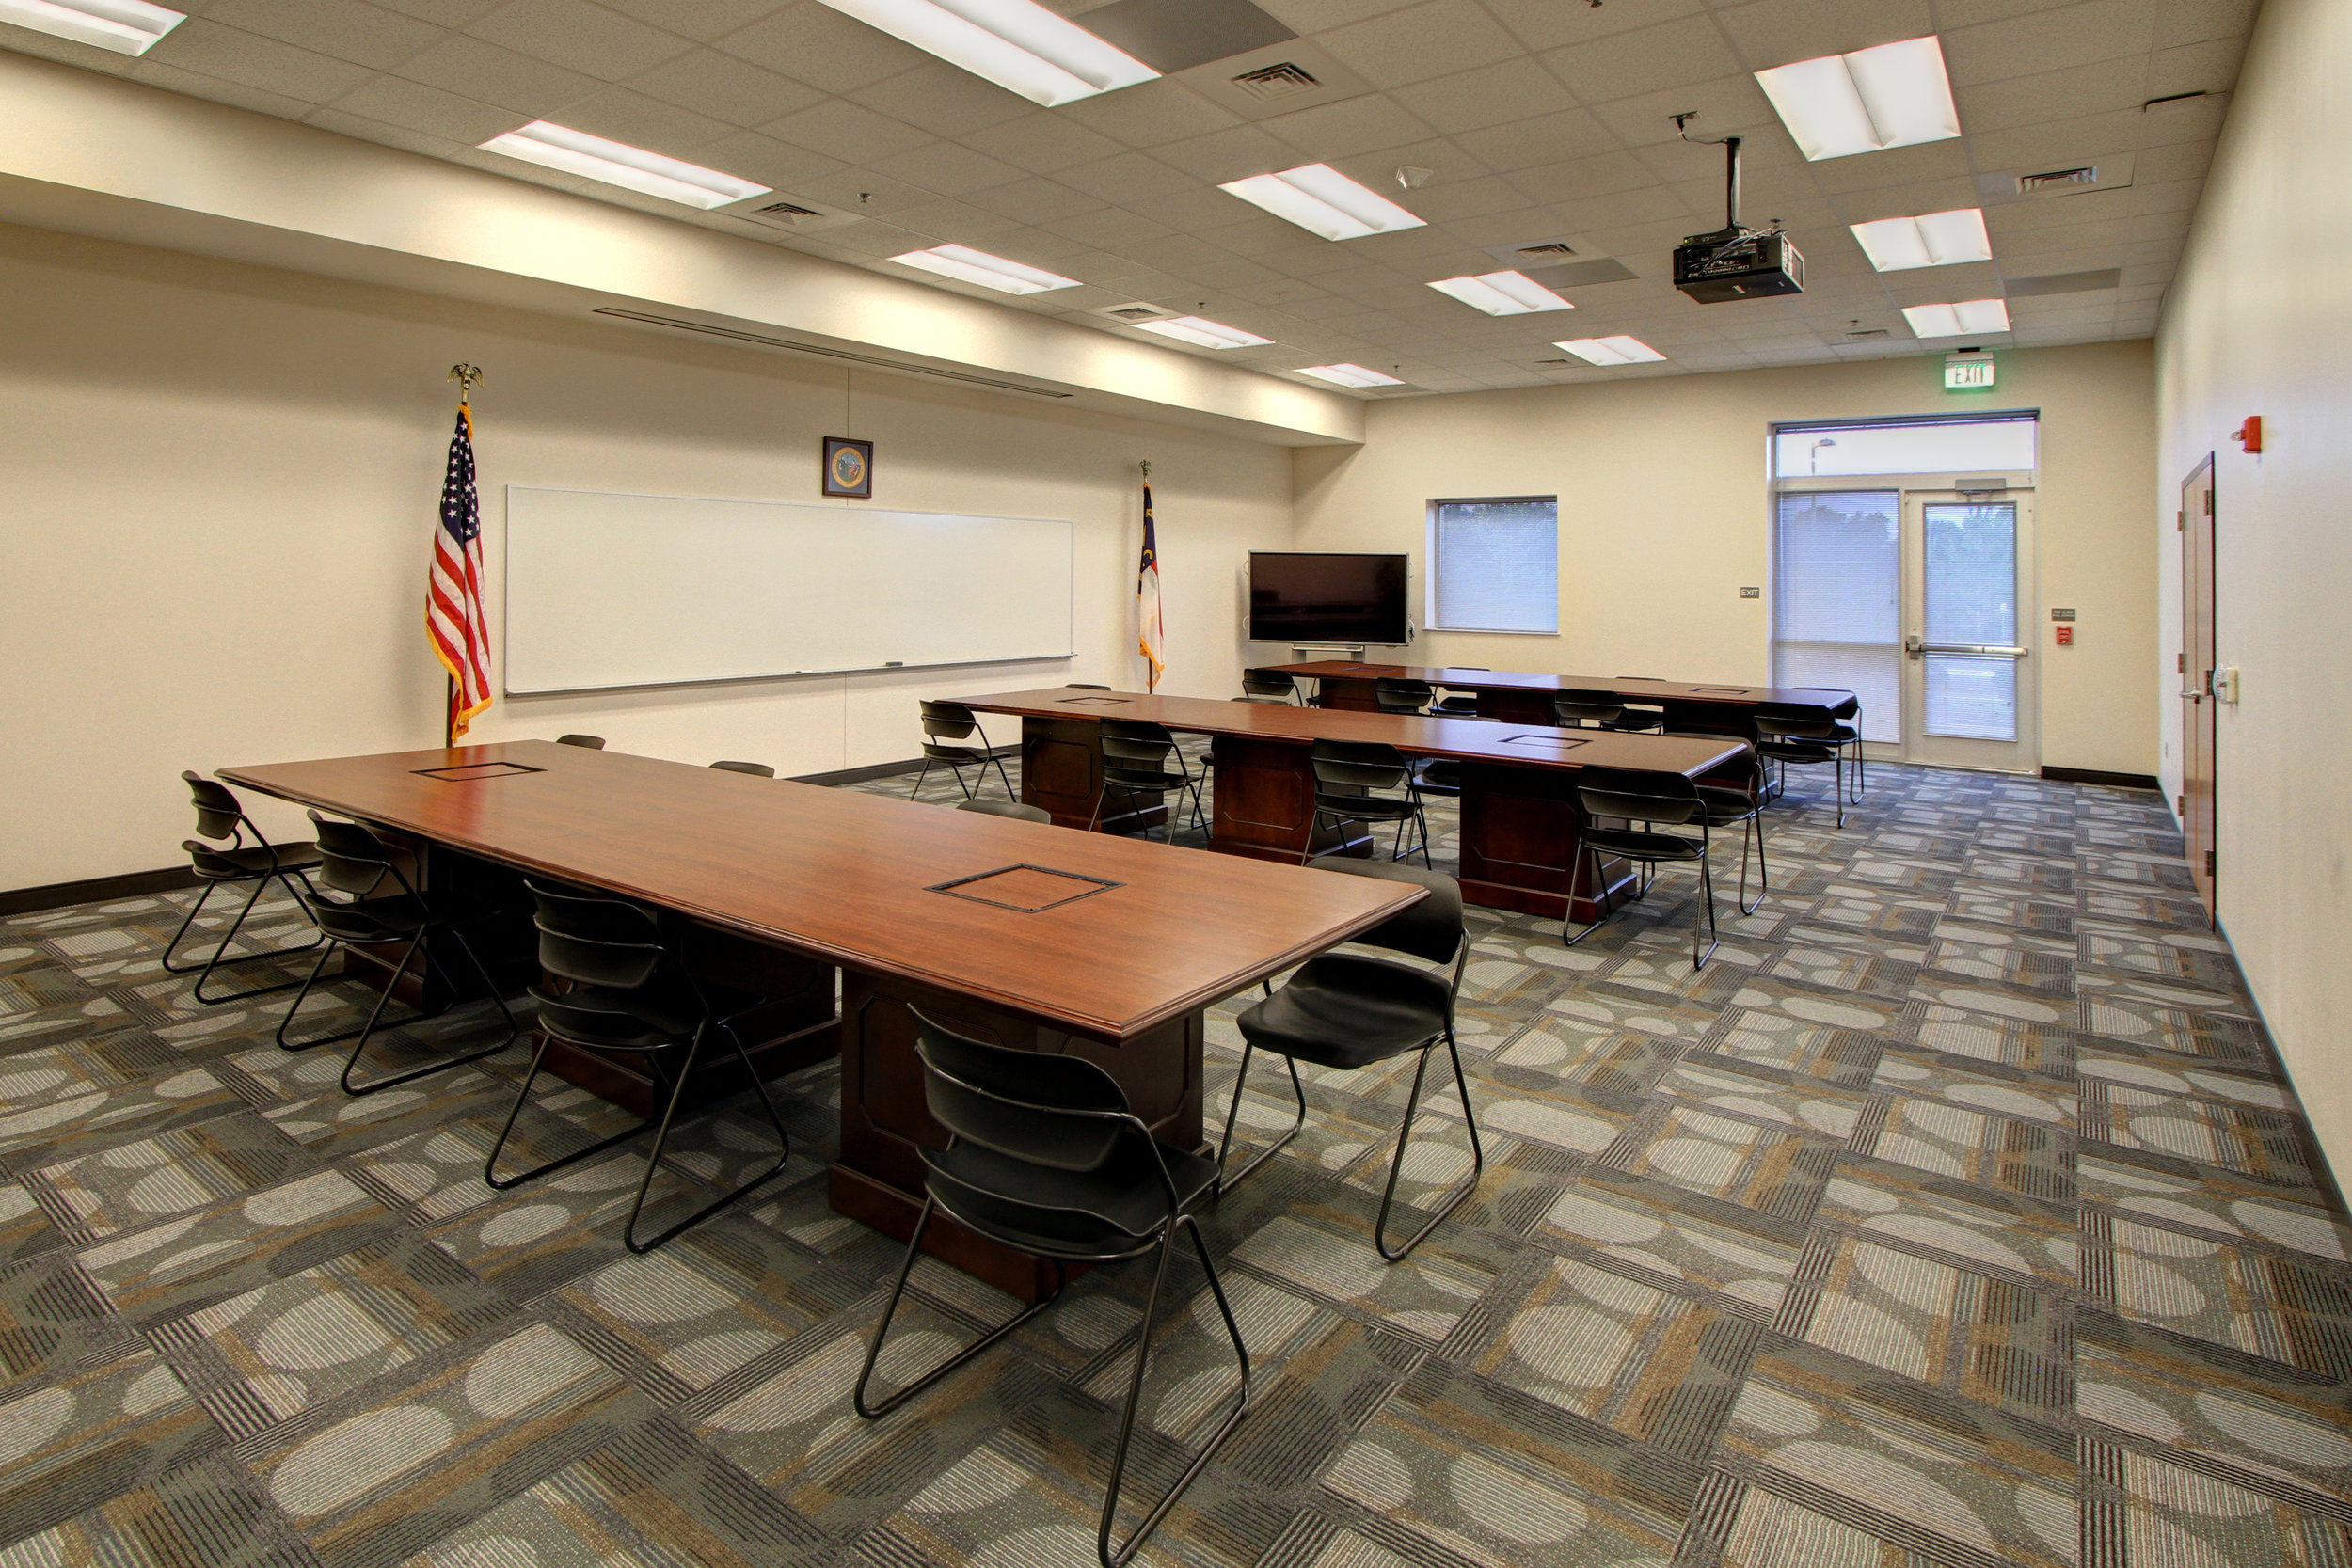 ADW-Public-Safety-Office-NC-DOT-DMV-SHP-Huntersville-NC-Interior-5.JPG